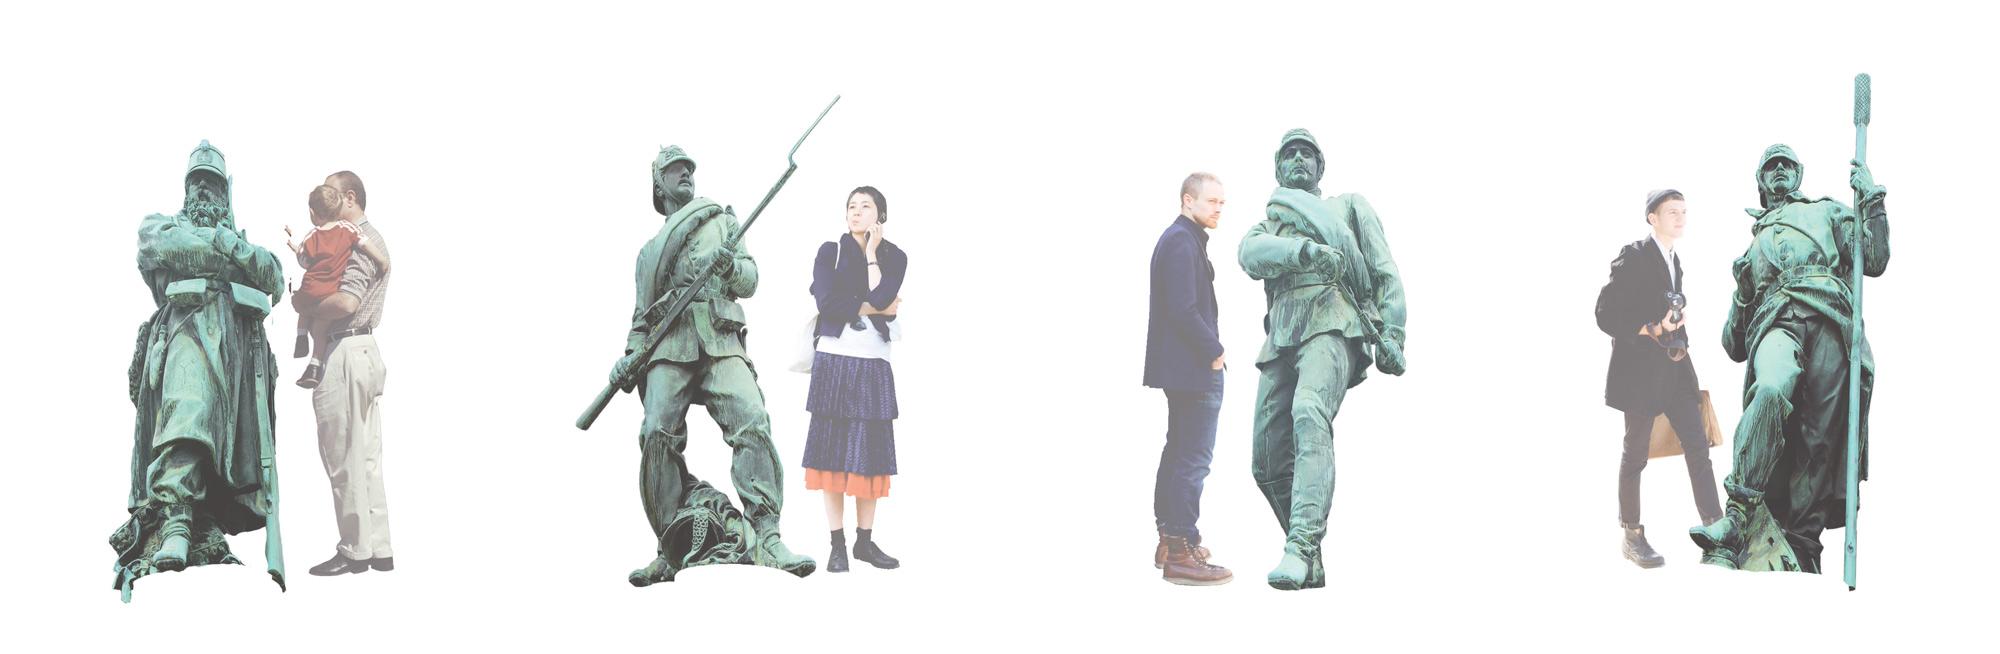 Sprechende-Skulpturen-Collage_OFICINAA_web